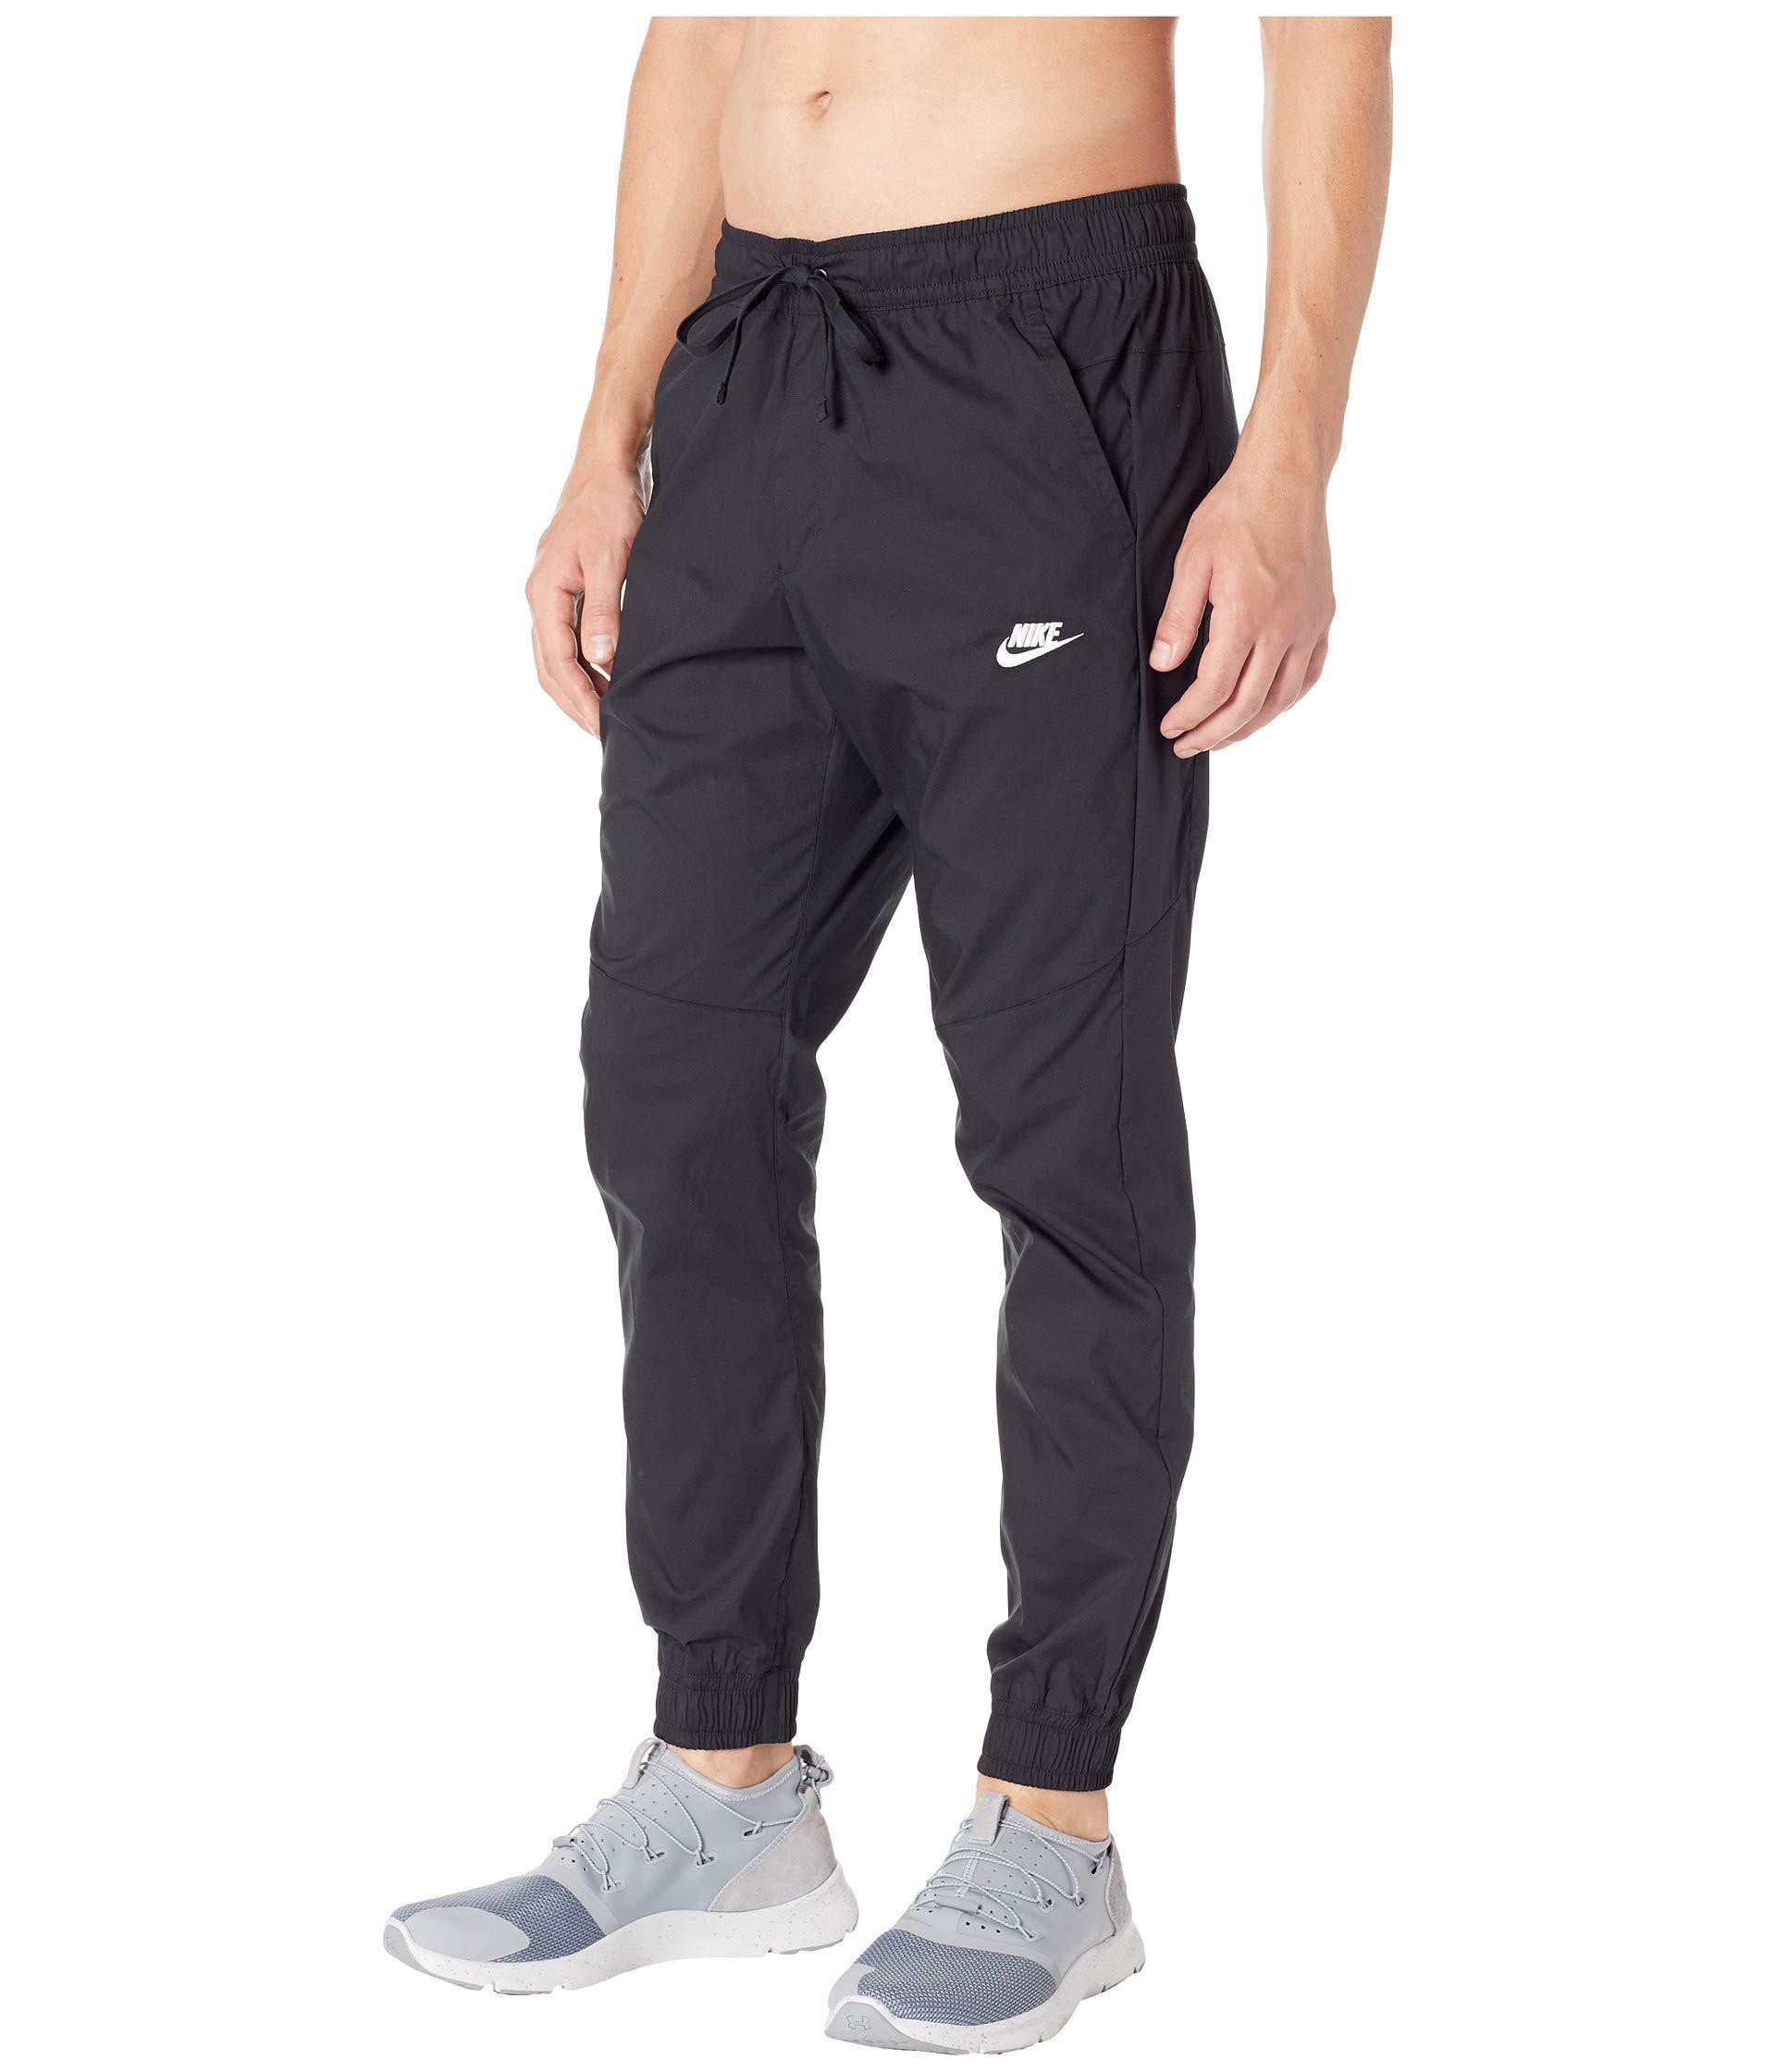 11325b877a57 Lyst - Nike Nsw Jogger Woven Core Street (black white) Men s Casual Pants  in Black for Men